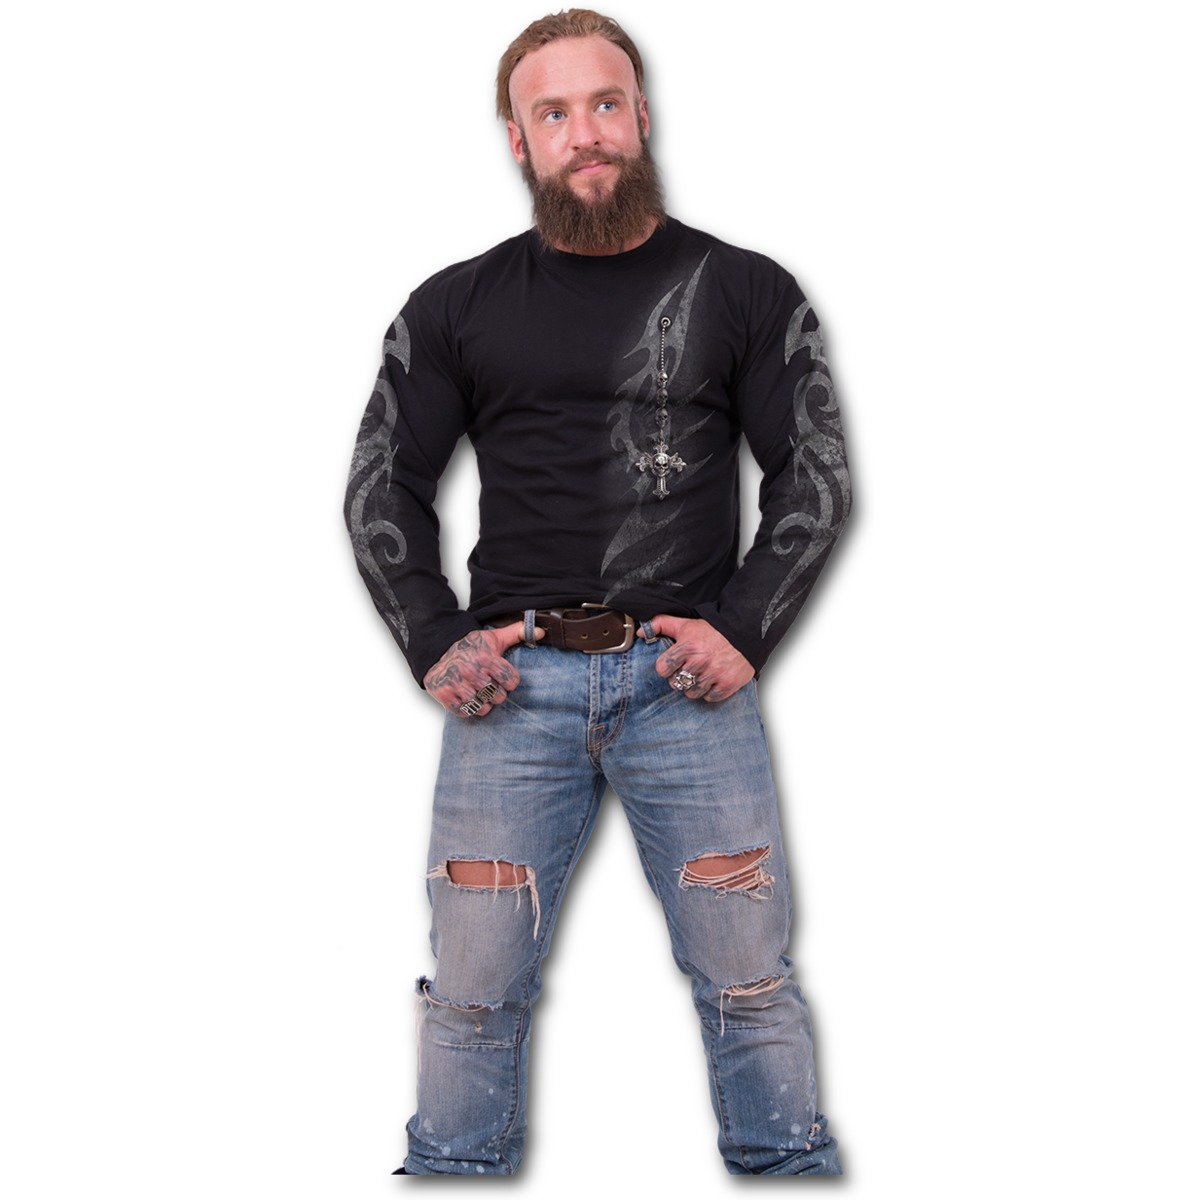 rebelsmarket_longsleeve_t_shirt_black_t_shirts_2.jpg